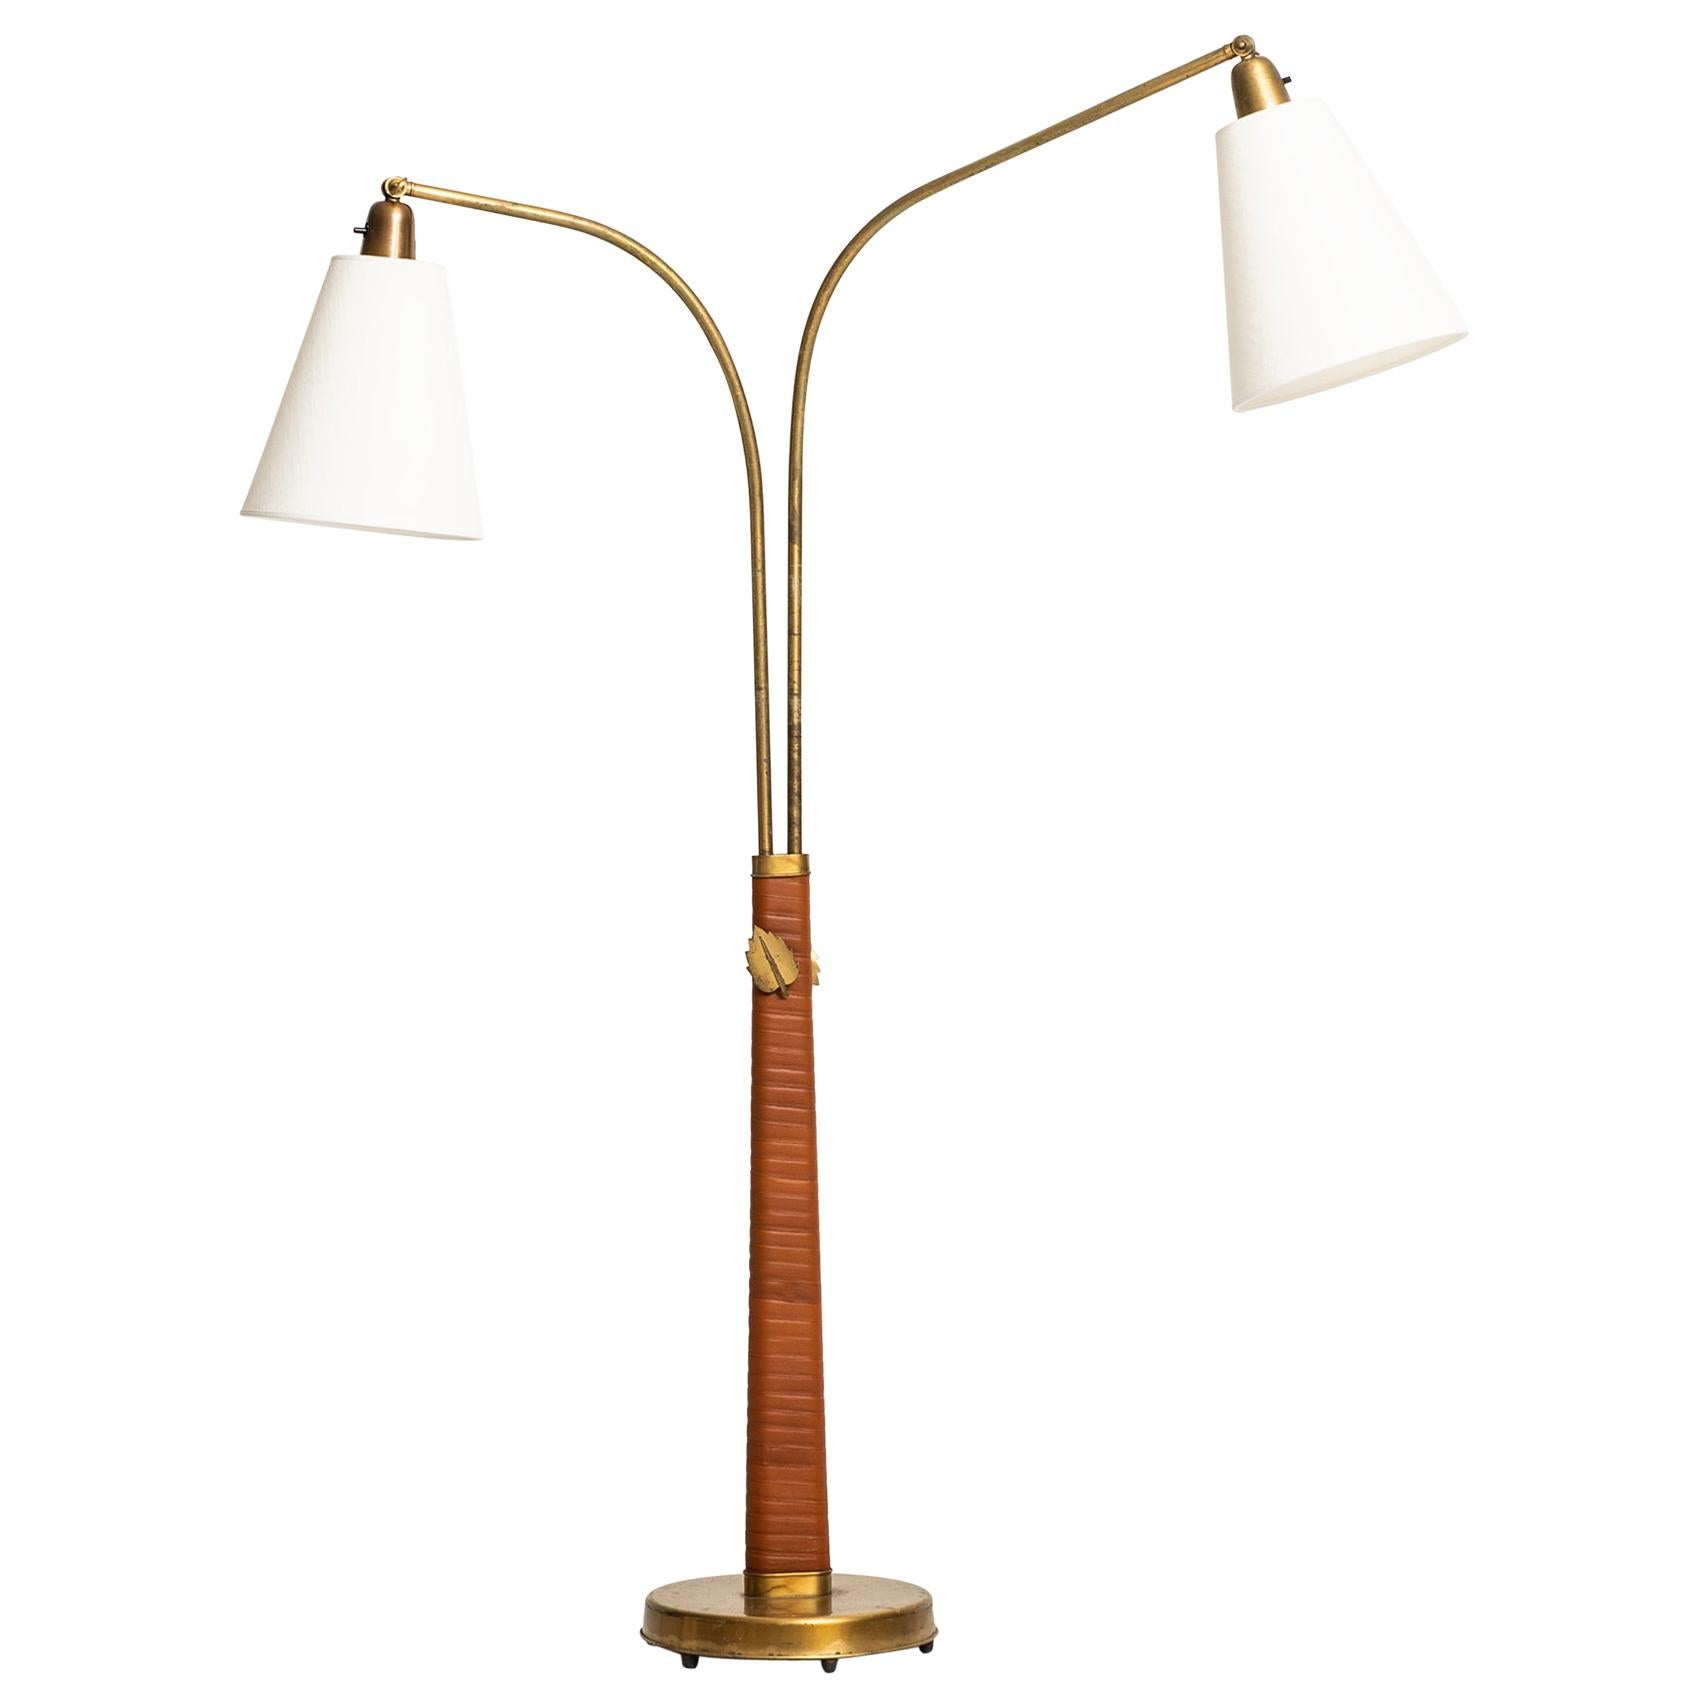 Hans Bergström Floor Lamp Model No 500 by Ateljé Lyktan in Åhus, Sweden